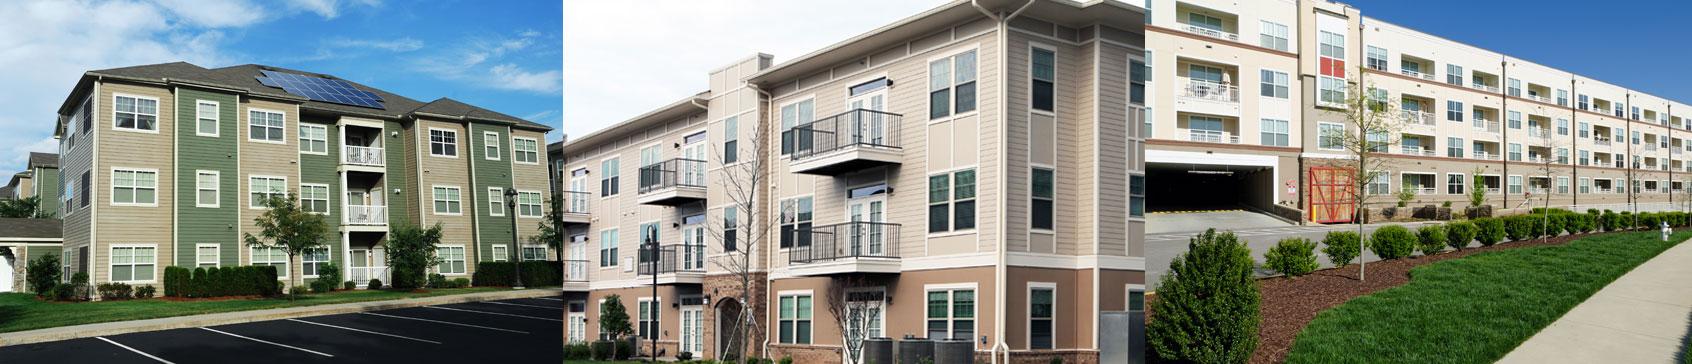 affordable-housing-pics